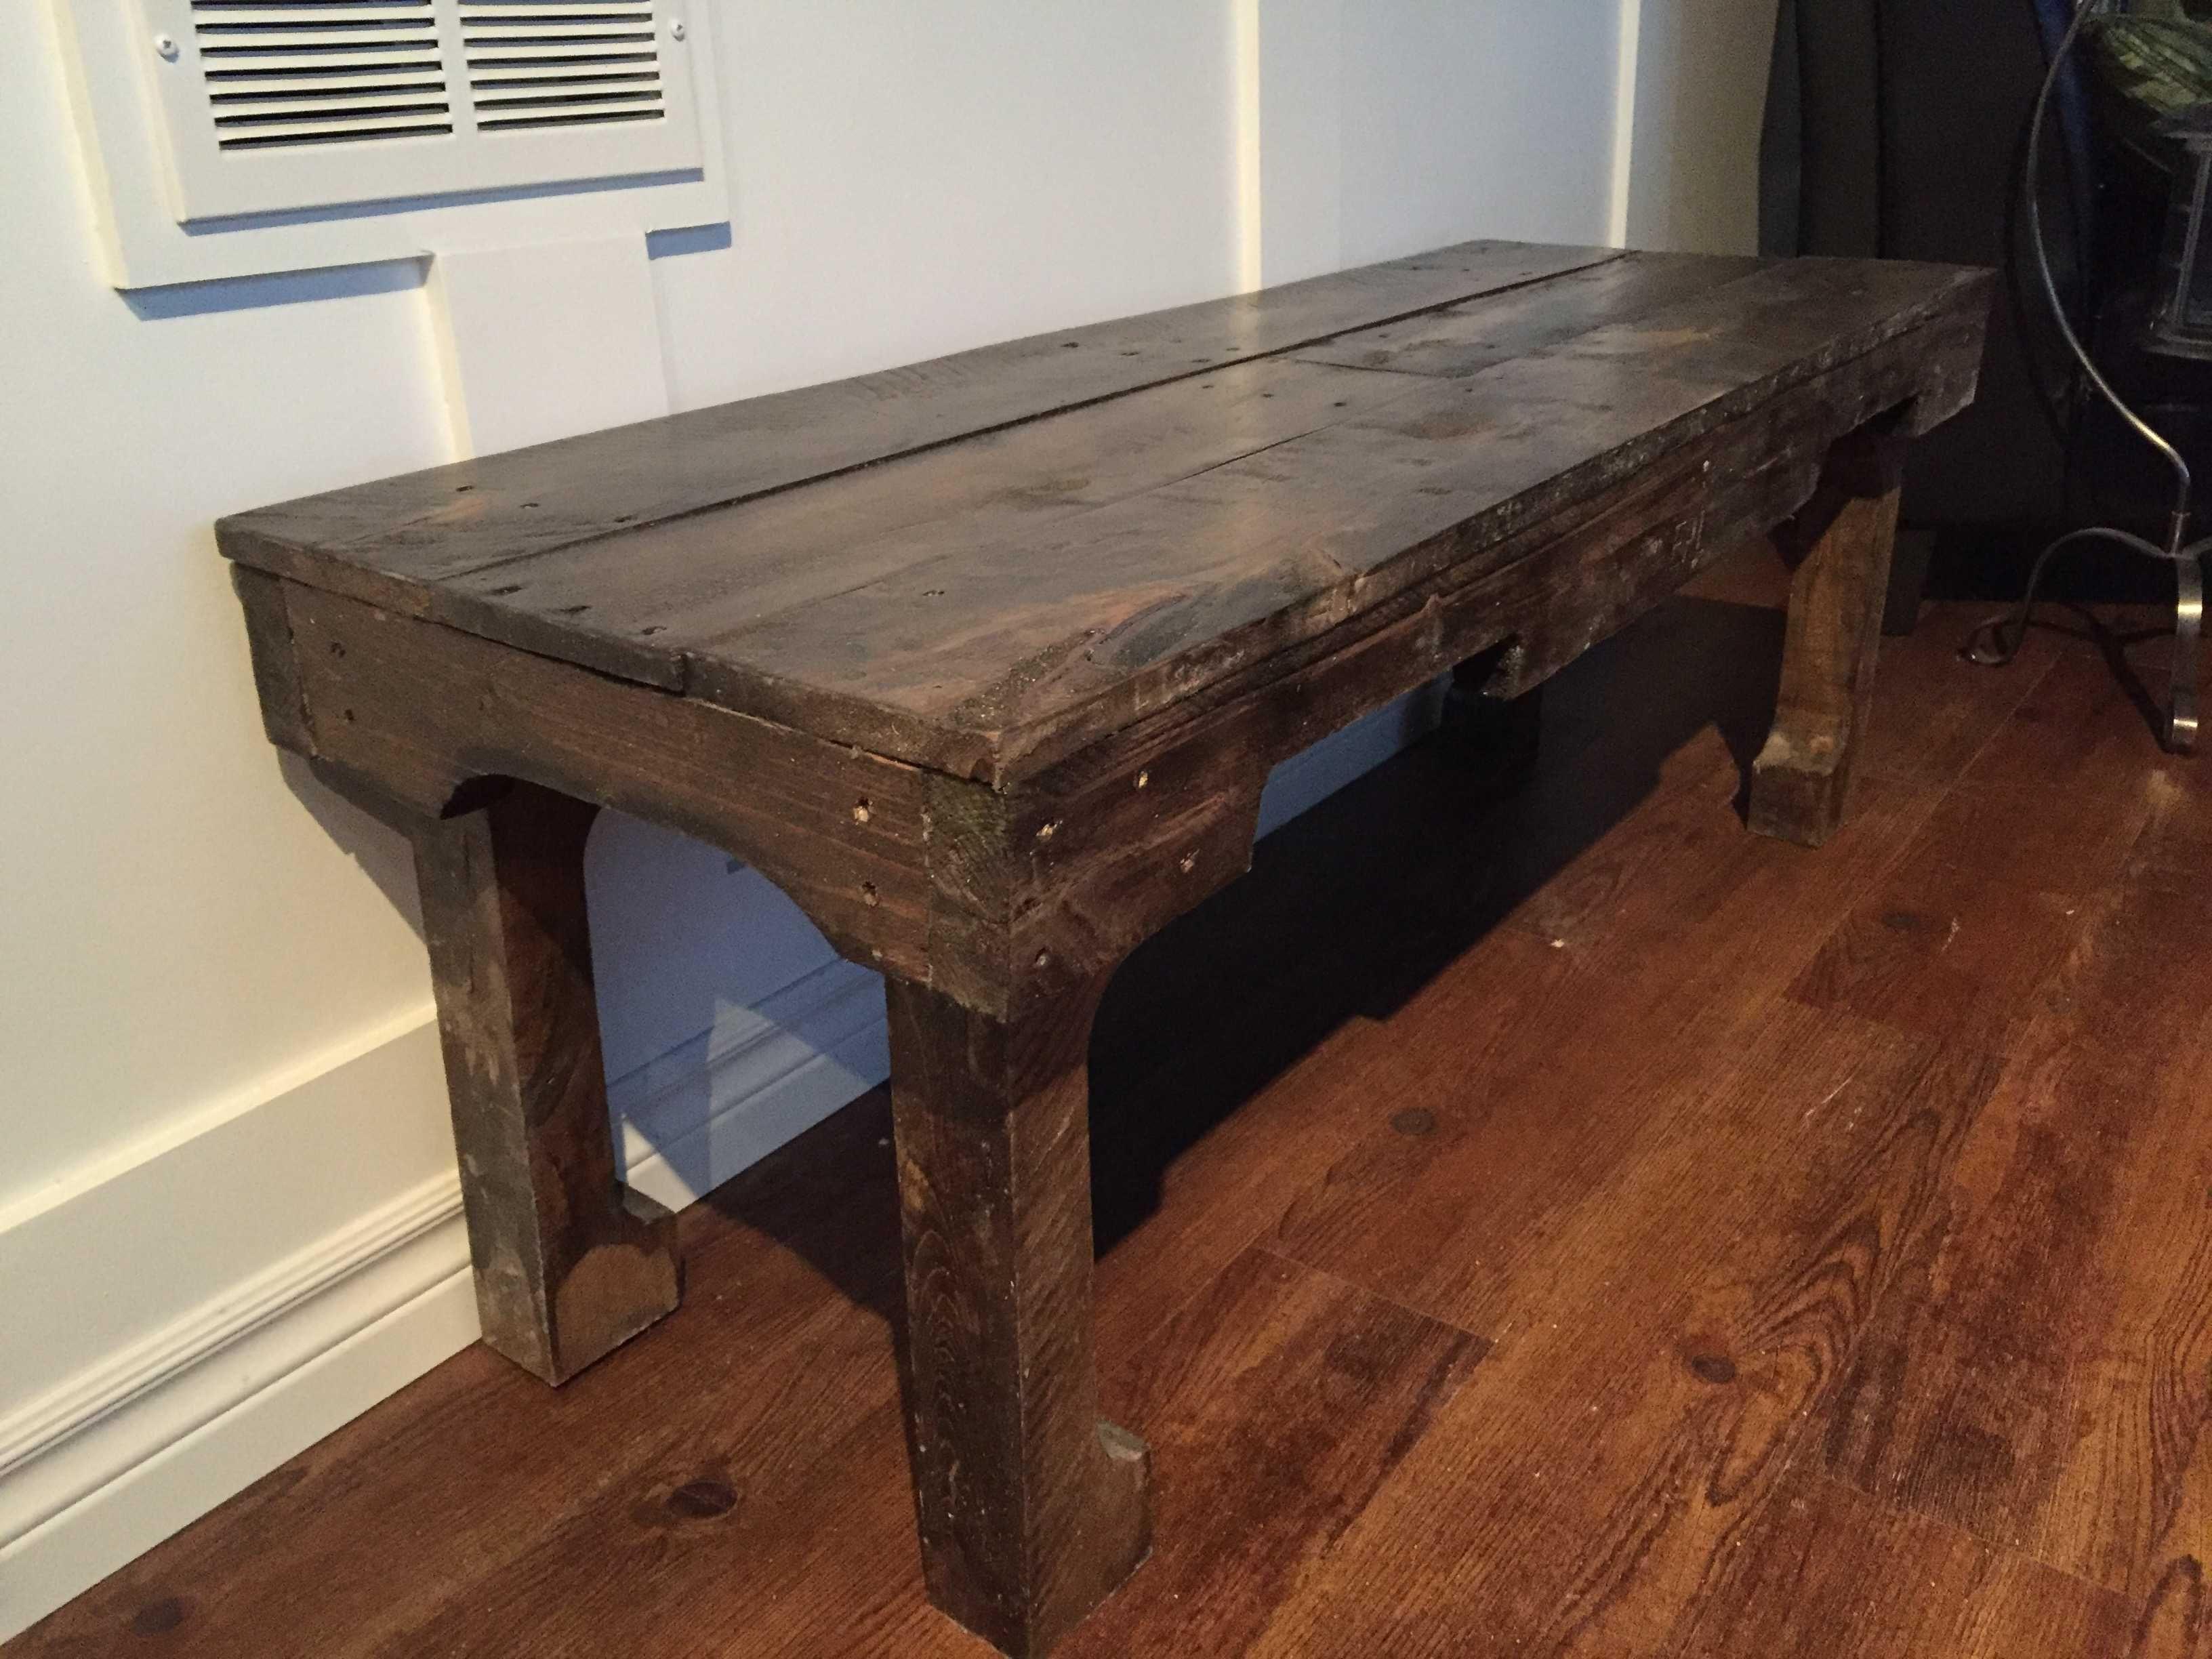 A Dark Walnut Extra Long Coffee Table 1001 Pallets Long Coffee Tables Coffee Table Coffee Table Design [ 2448 x 3264 Pixel ]